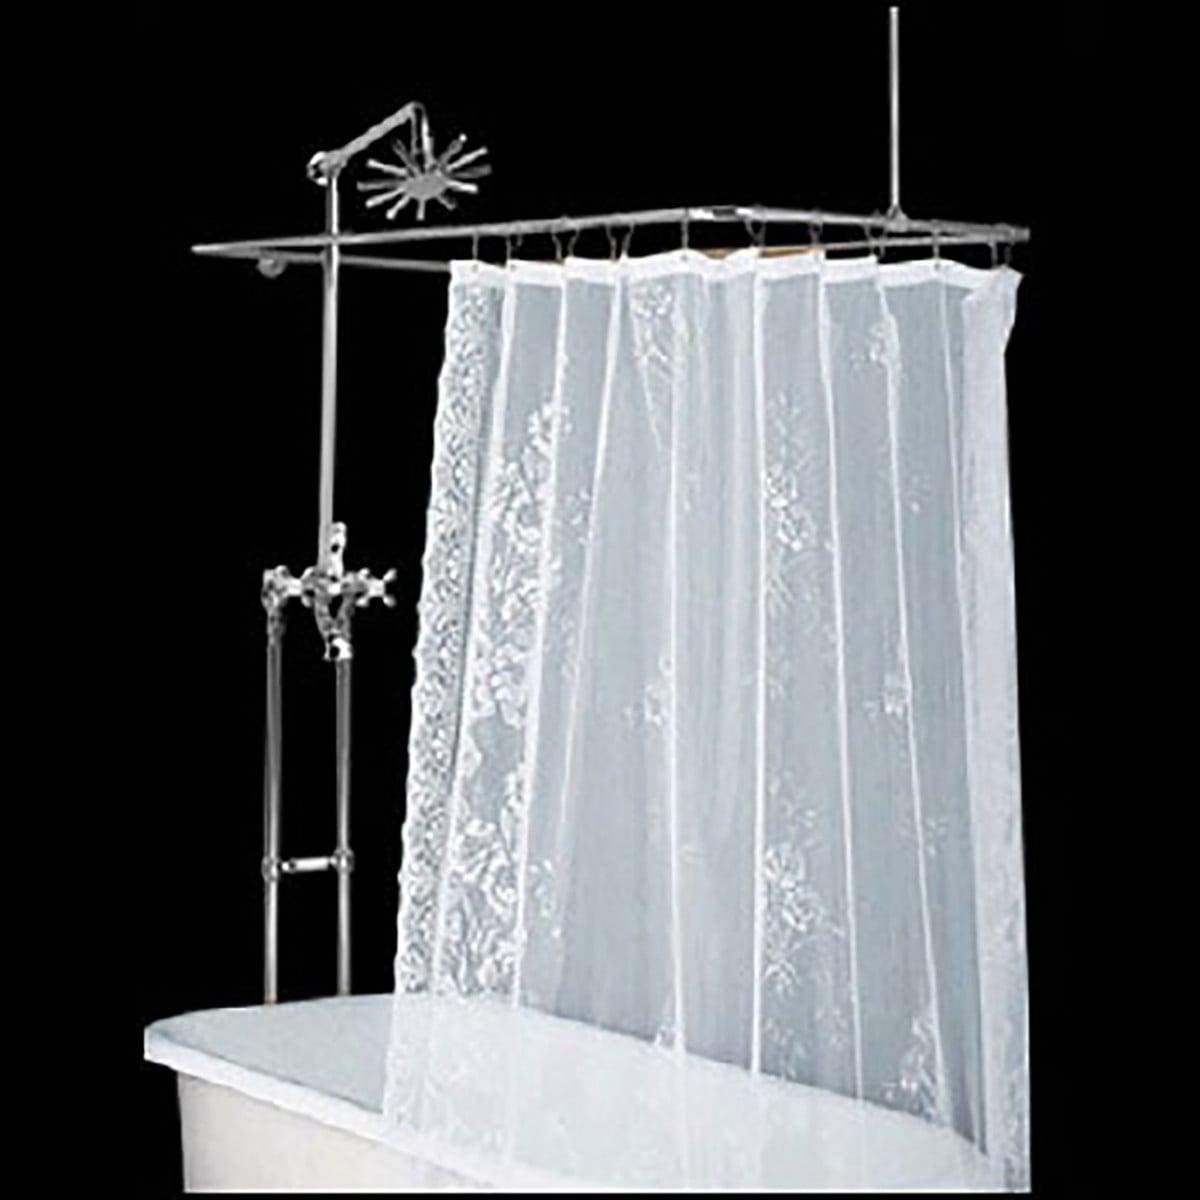 Clawfoot Tub Freestanding Shower Set Rectangular Enclosure Renovator S Supply